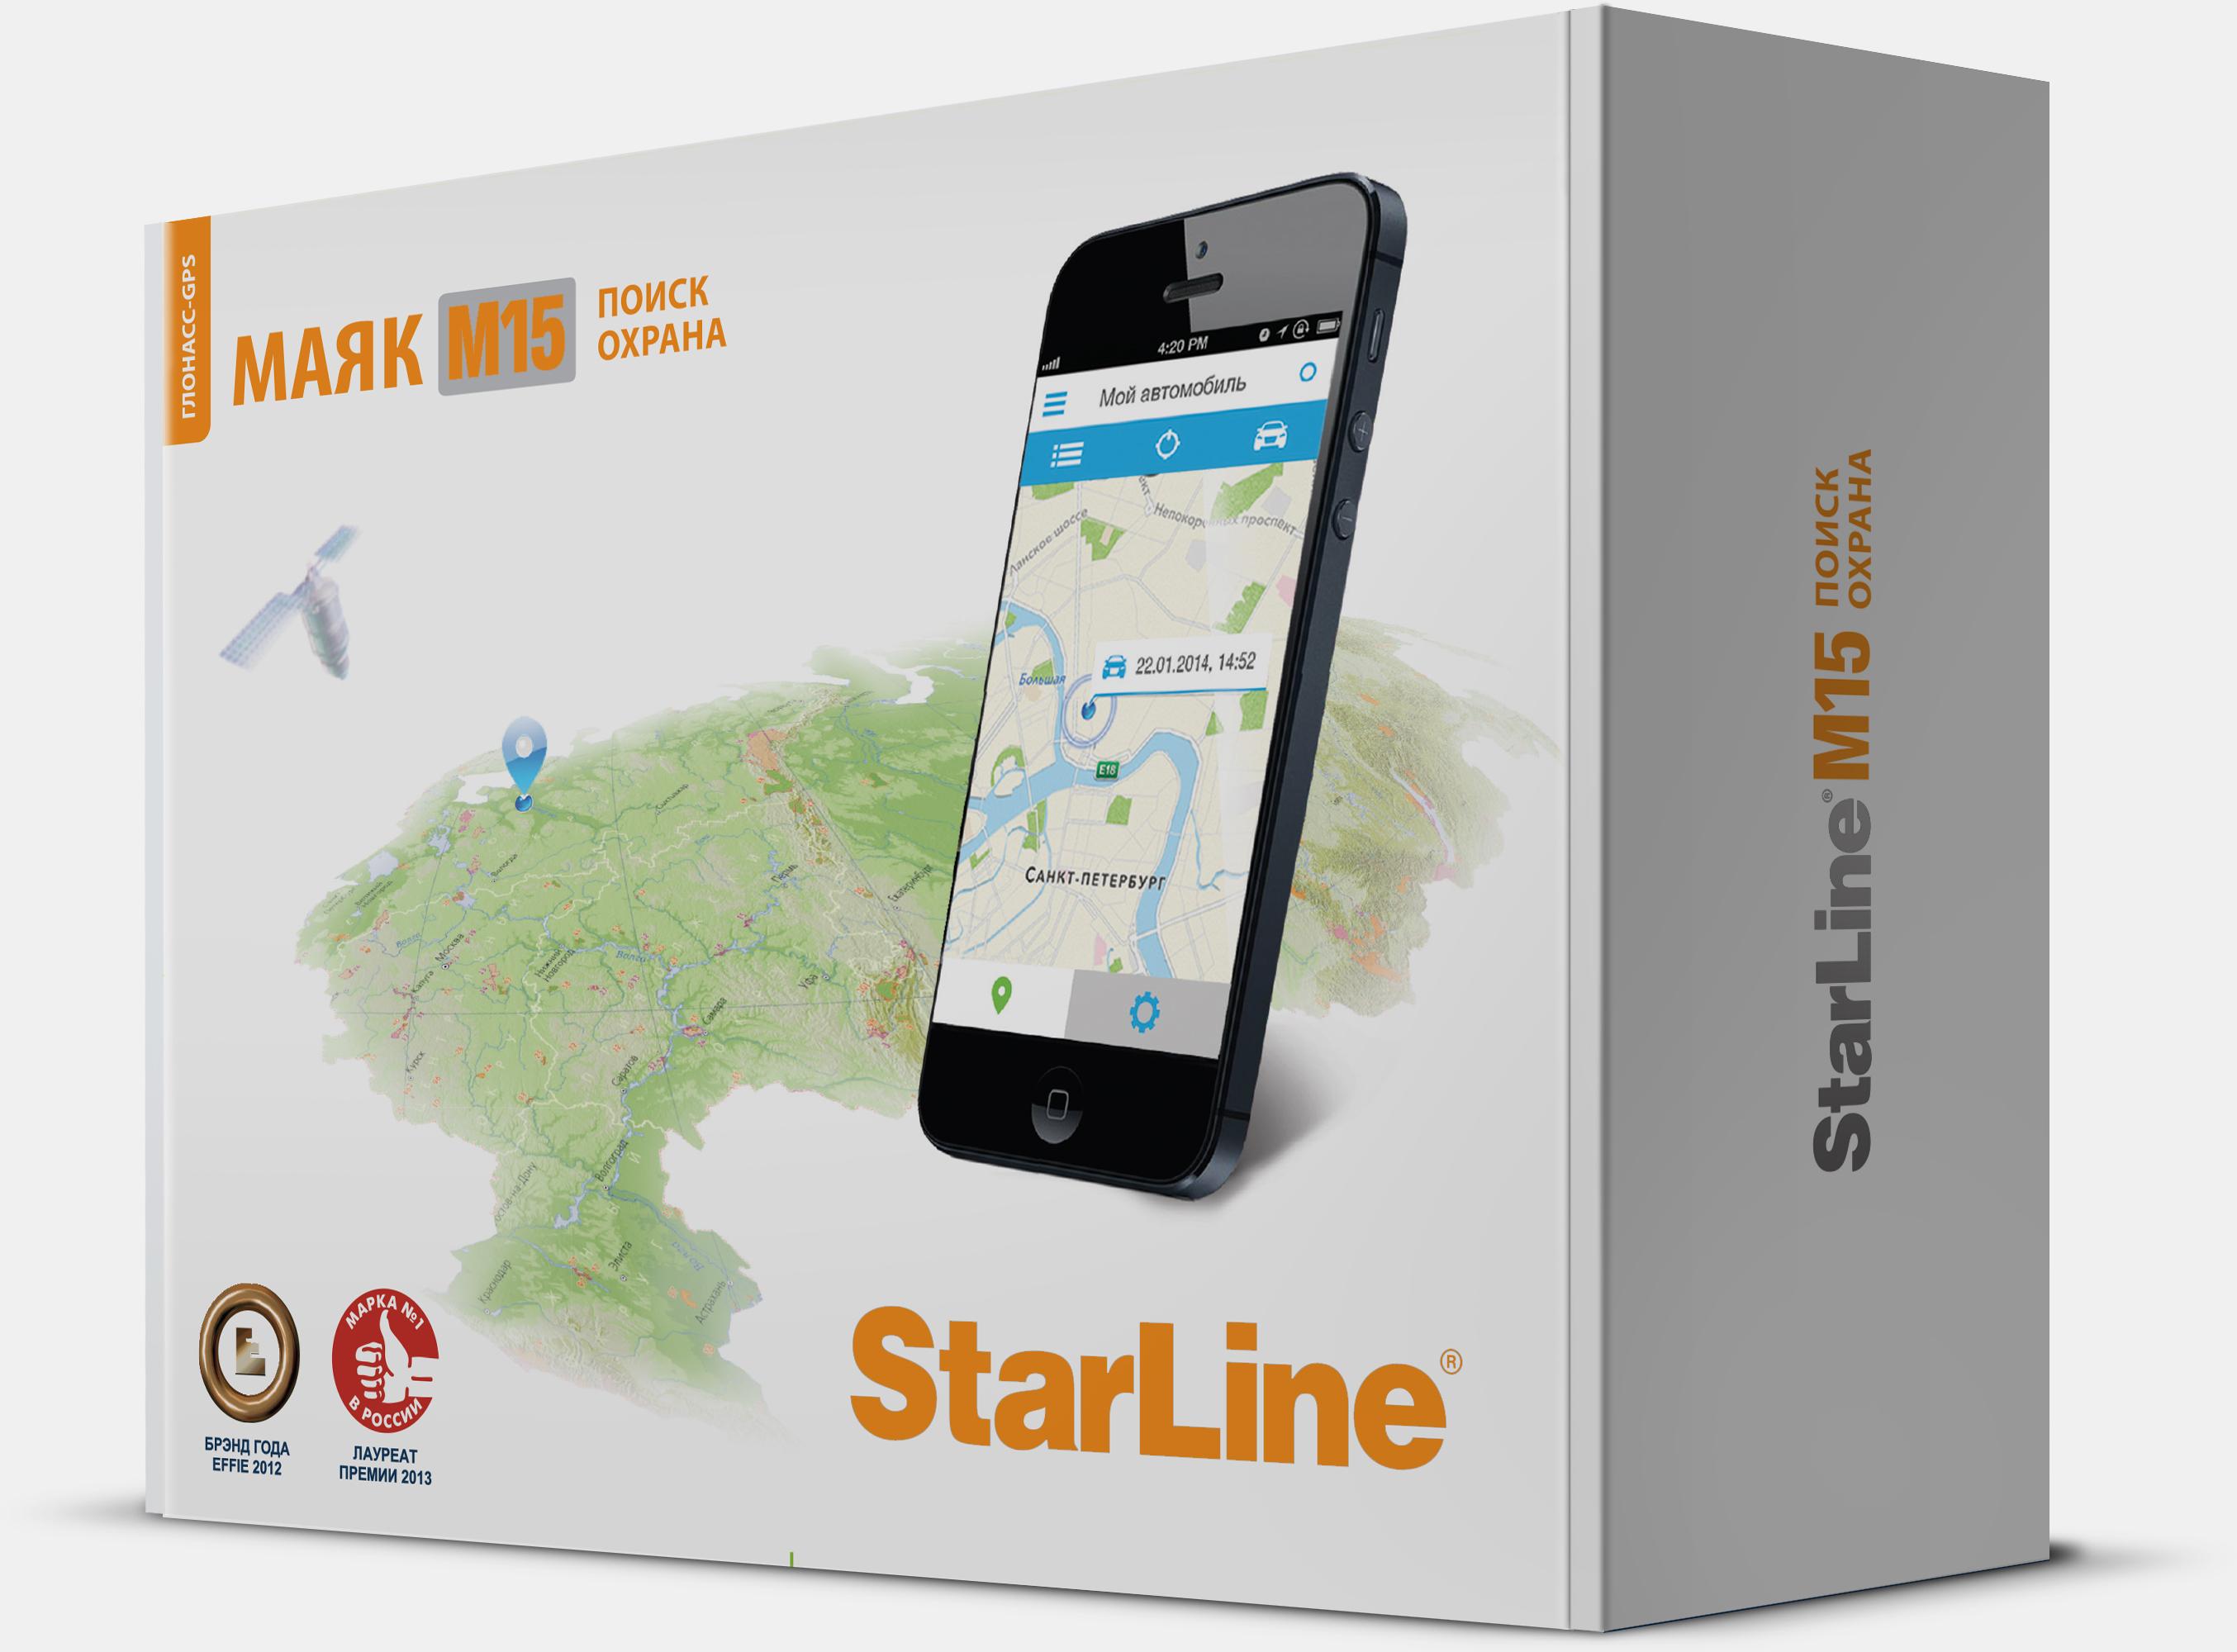 https://novosibirsk-starline.avto-guard.ru/wp-content/uploads/2017/08/Starline-M15.jpg 227x168